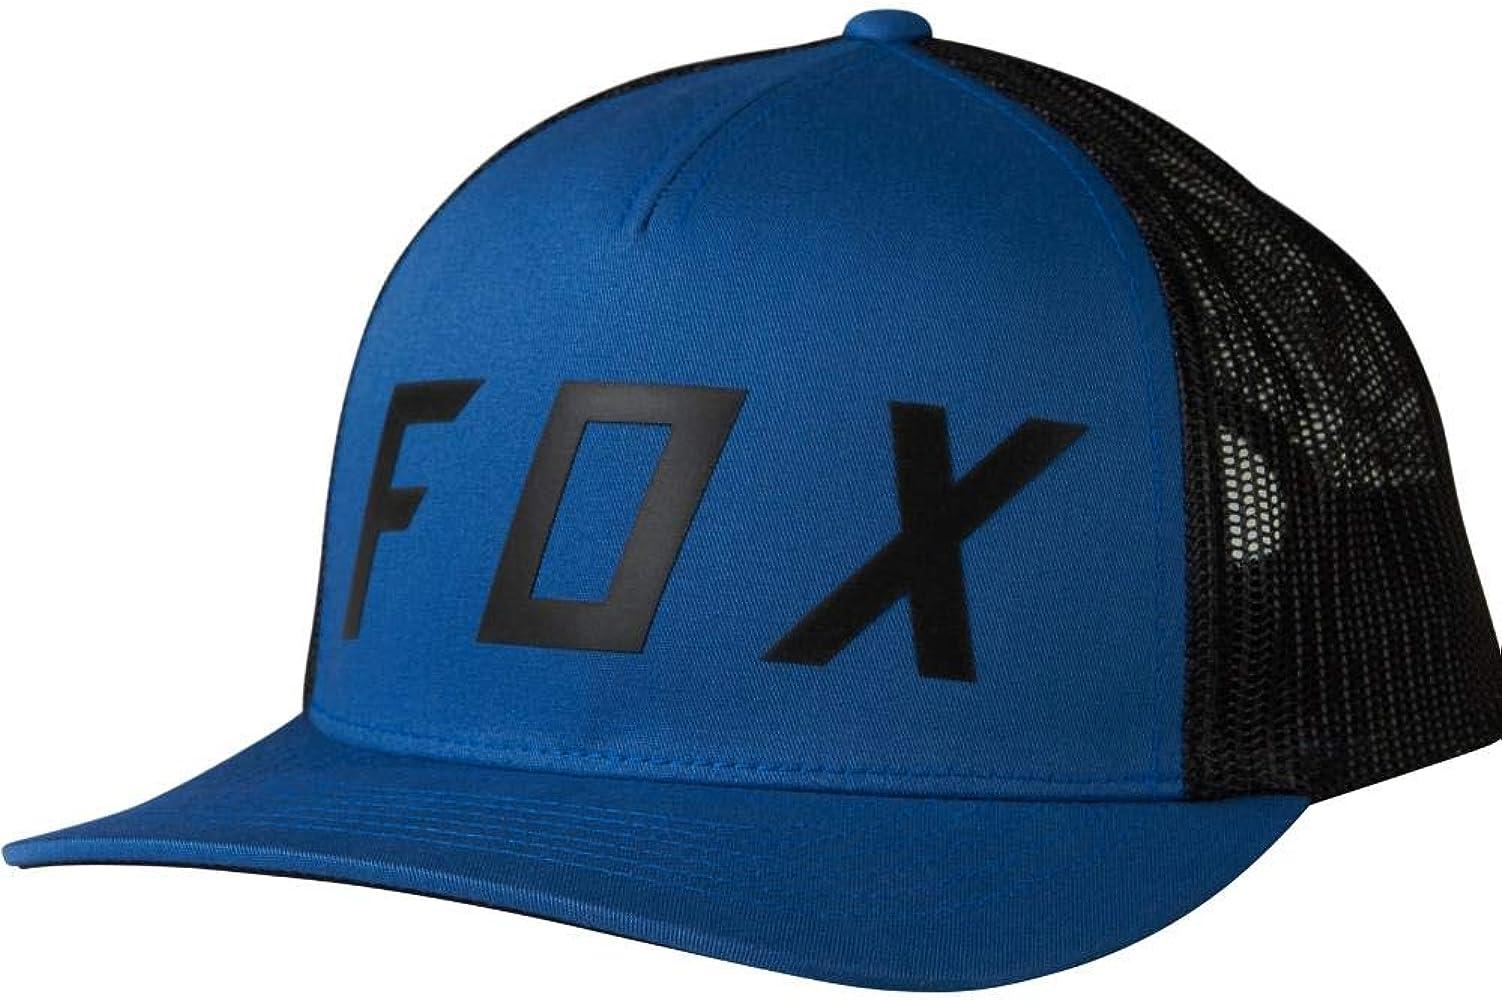 Fox Cap Lady Moth, Blue, talla OS: Fox: Amazon.es: Coche y moto